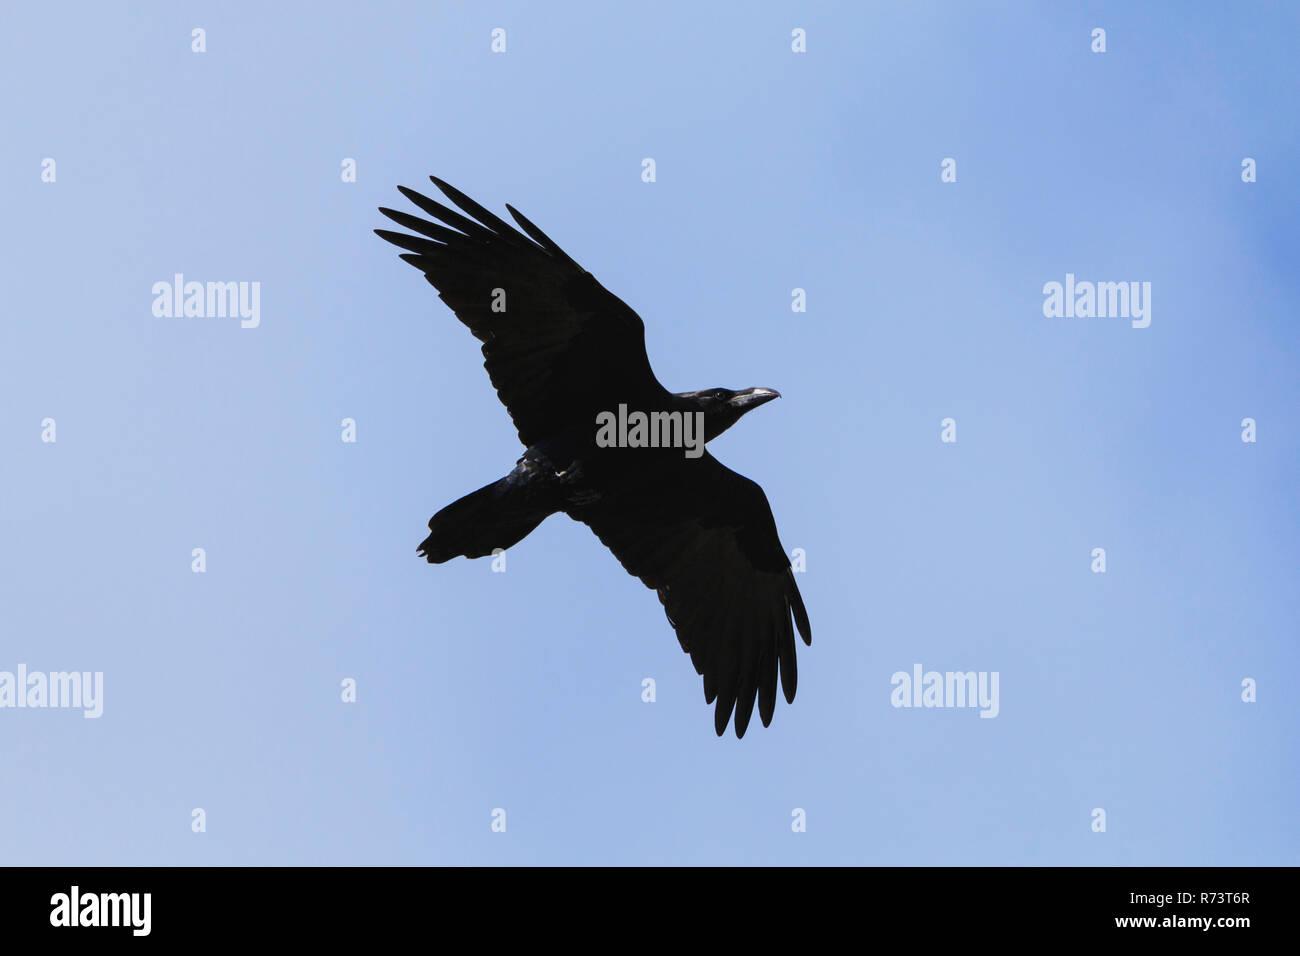 Common raven Corvus corax flying siluet in blue sky - Stock Image